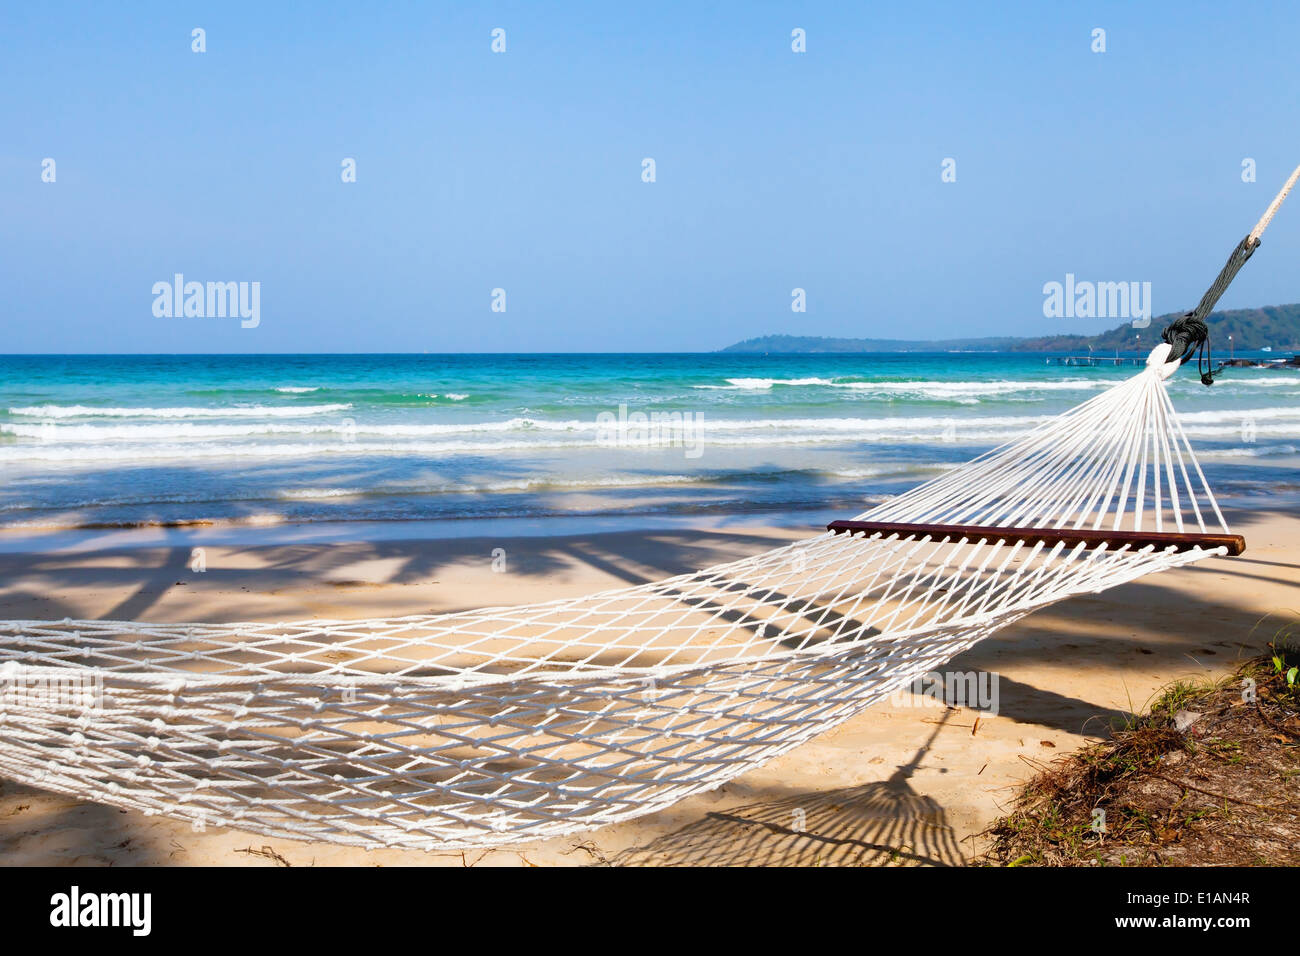 hammock on the beach - Stock Image